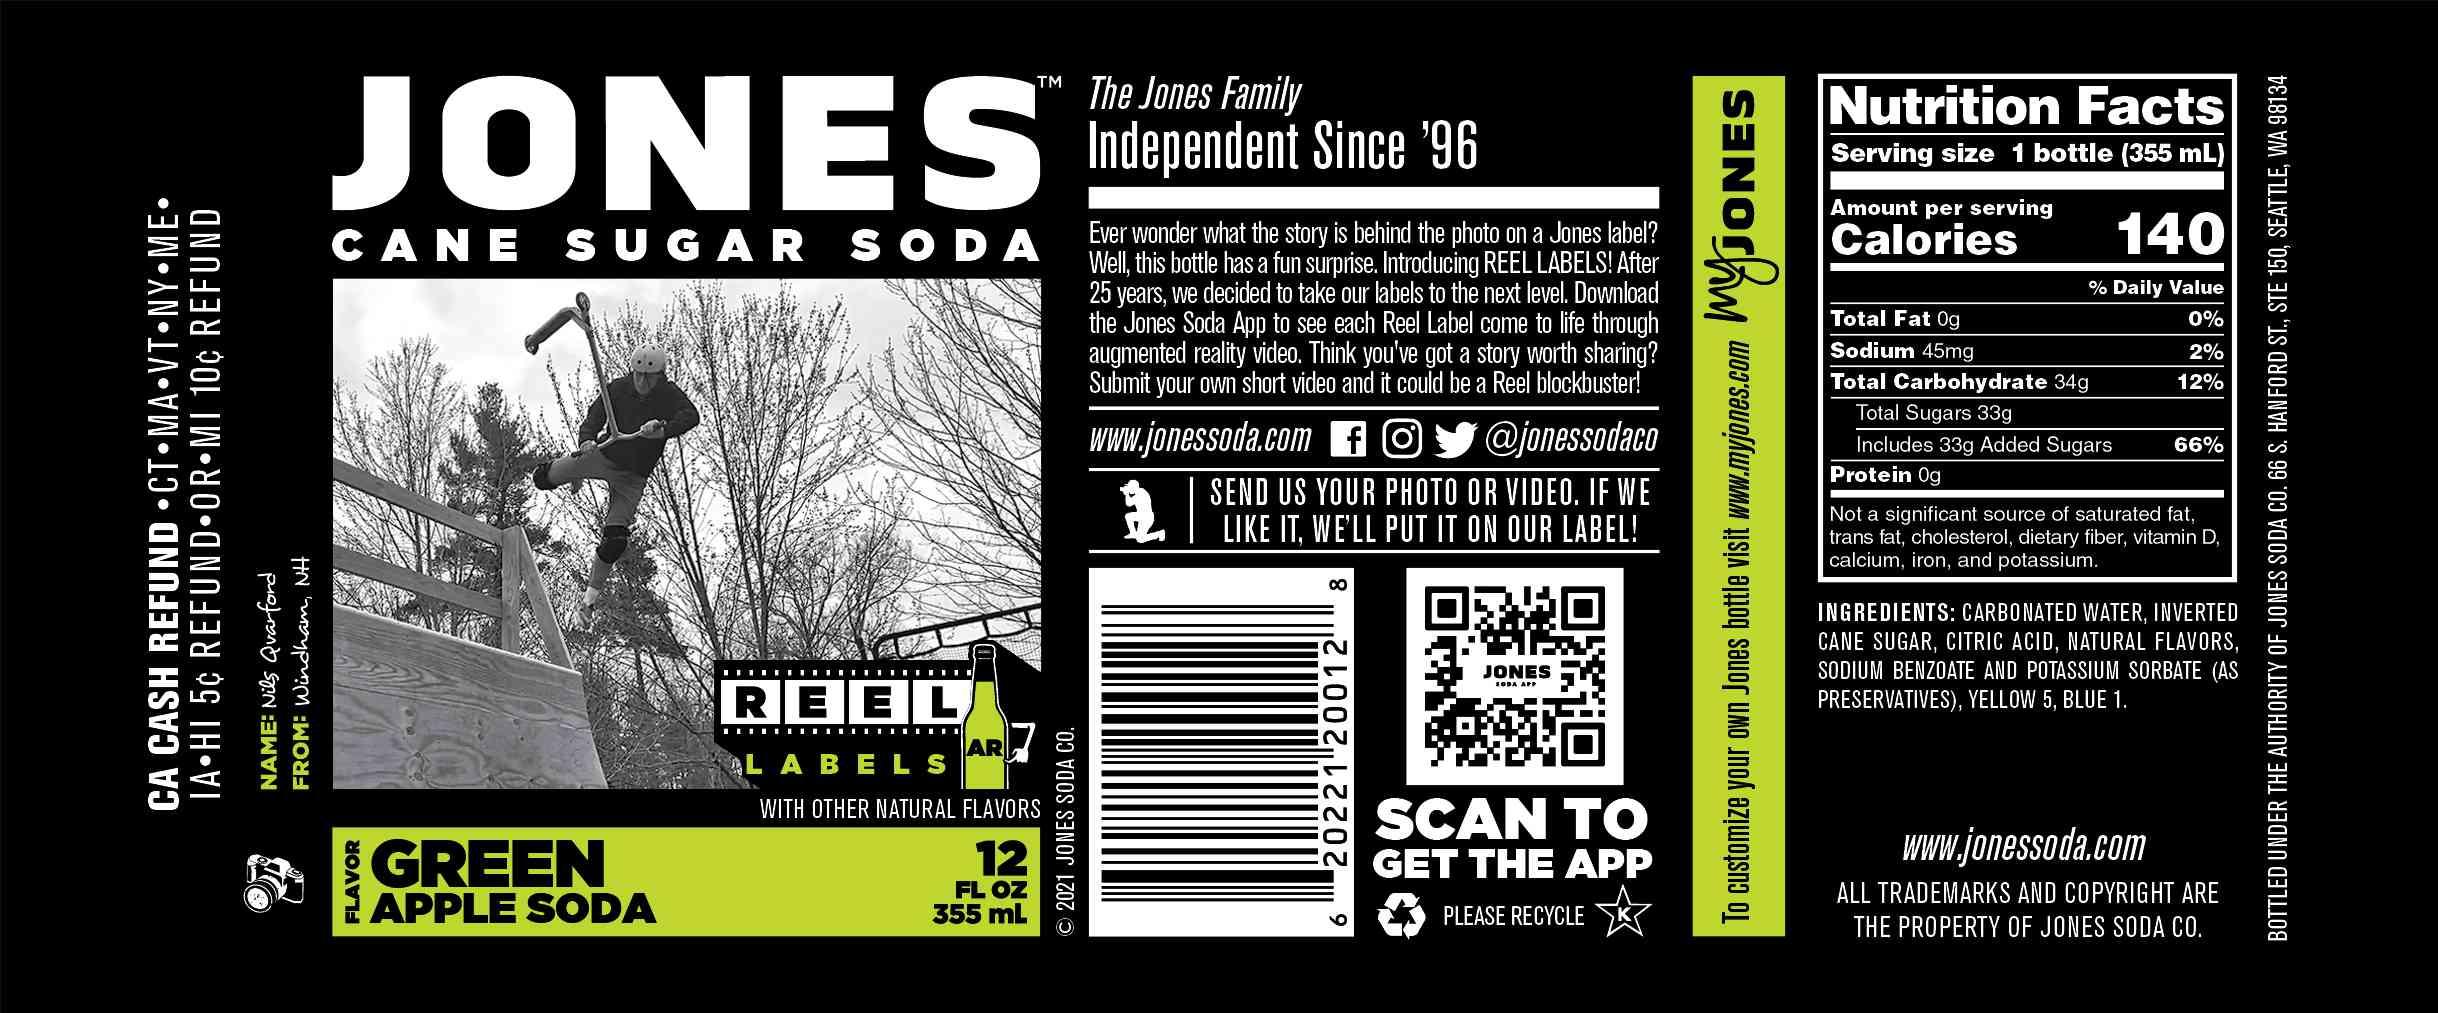 Jones Soda AR Label